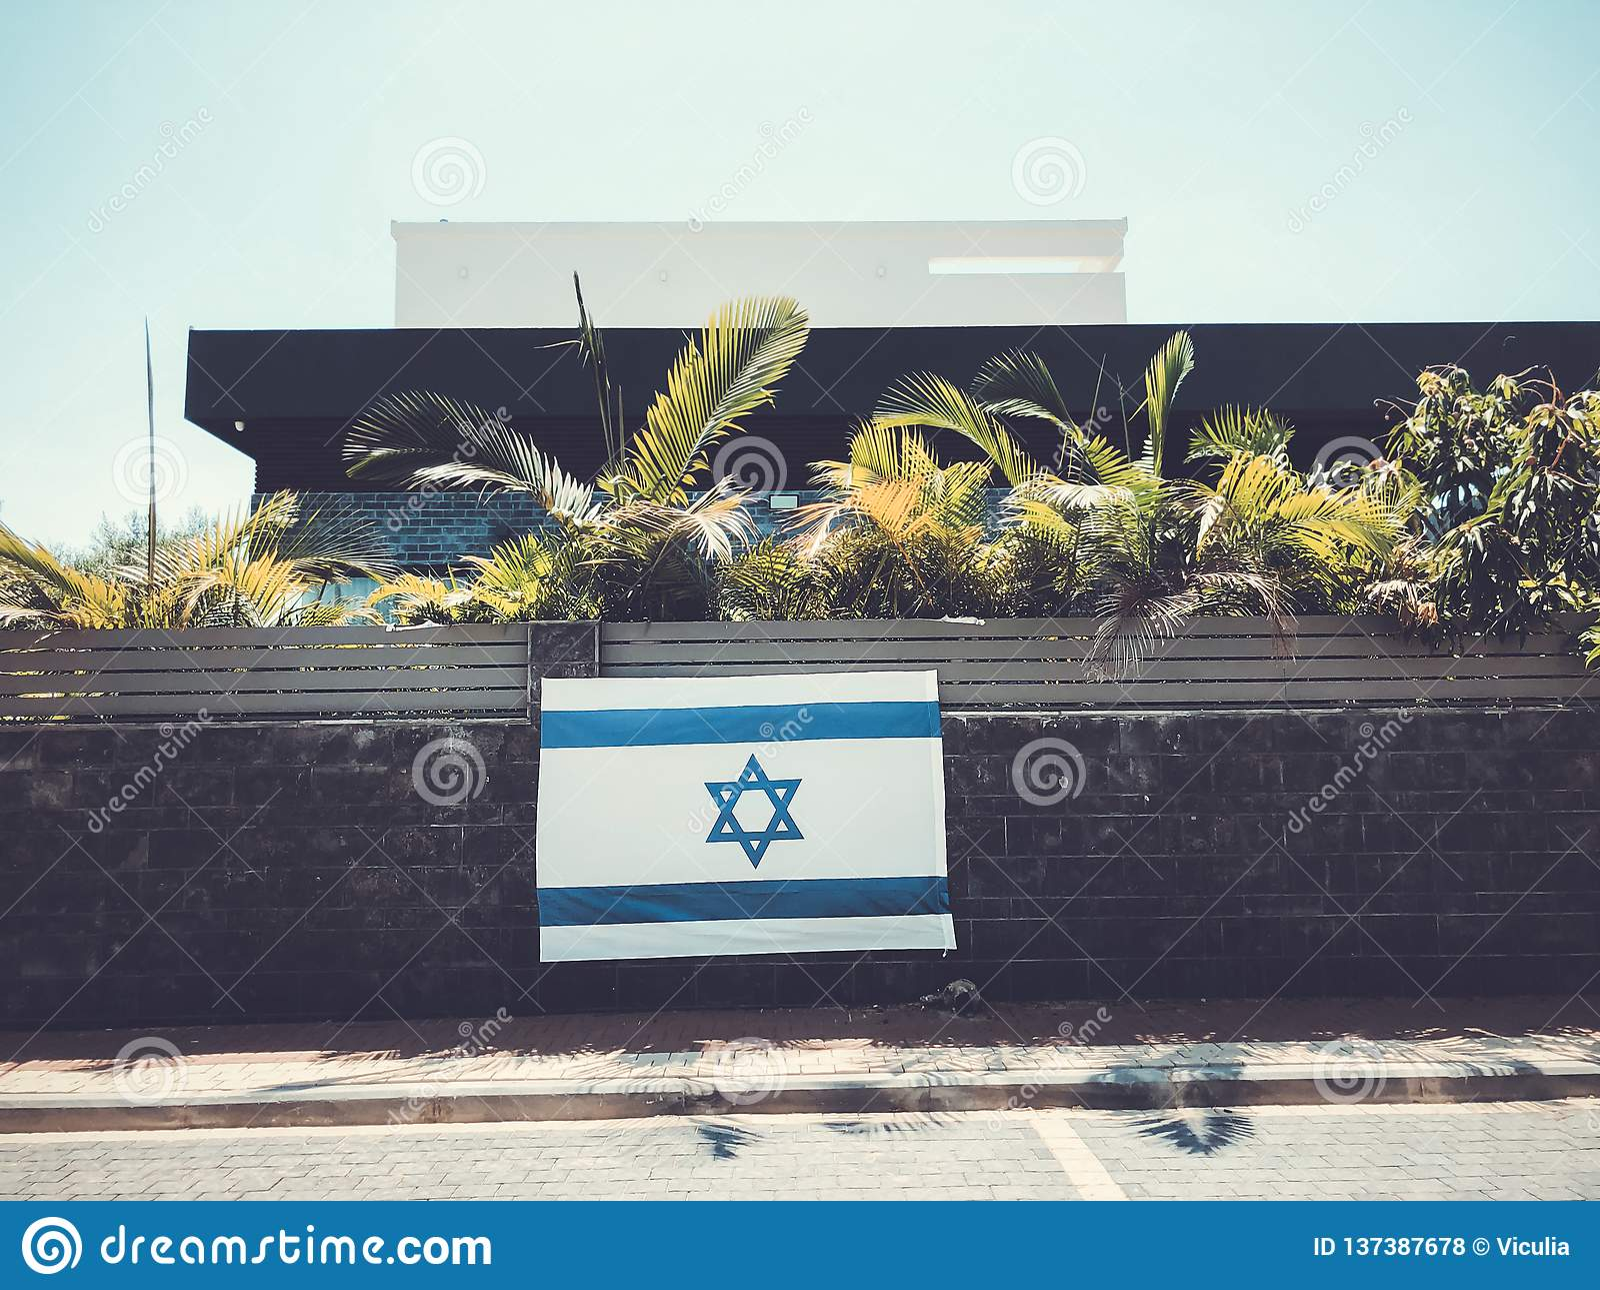 RISHON LE ZION, Staatsflagge ISRAELS - 27. Juni 2018 Israels, die ein Privateigentumszaun in Rishon Le Zion, Israel ist